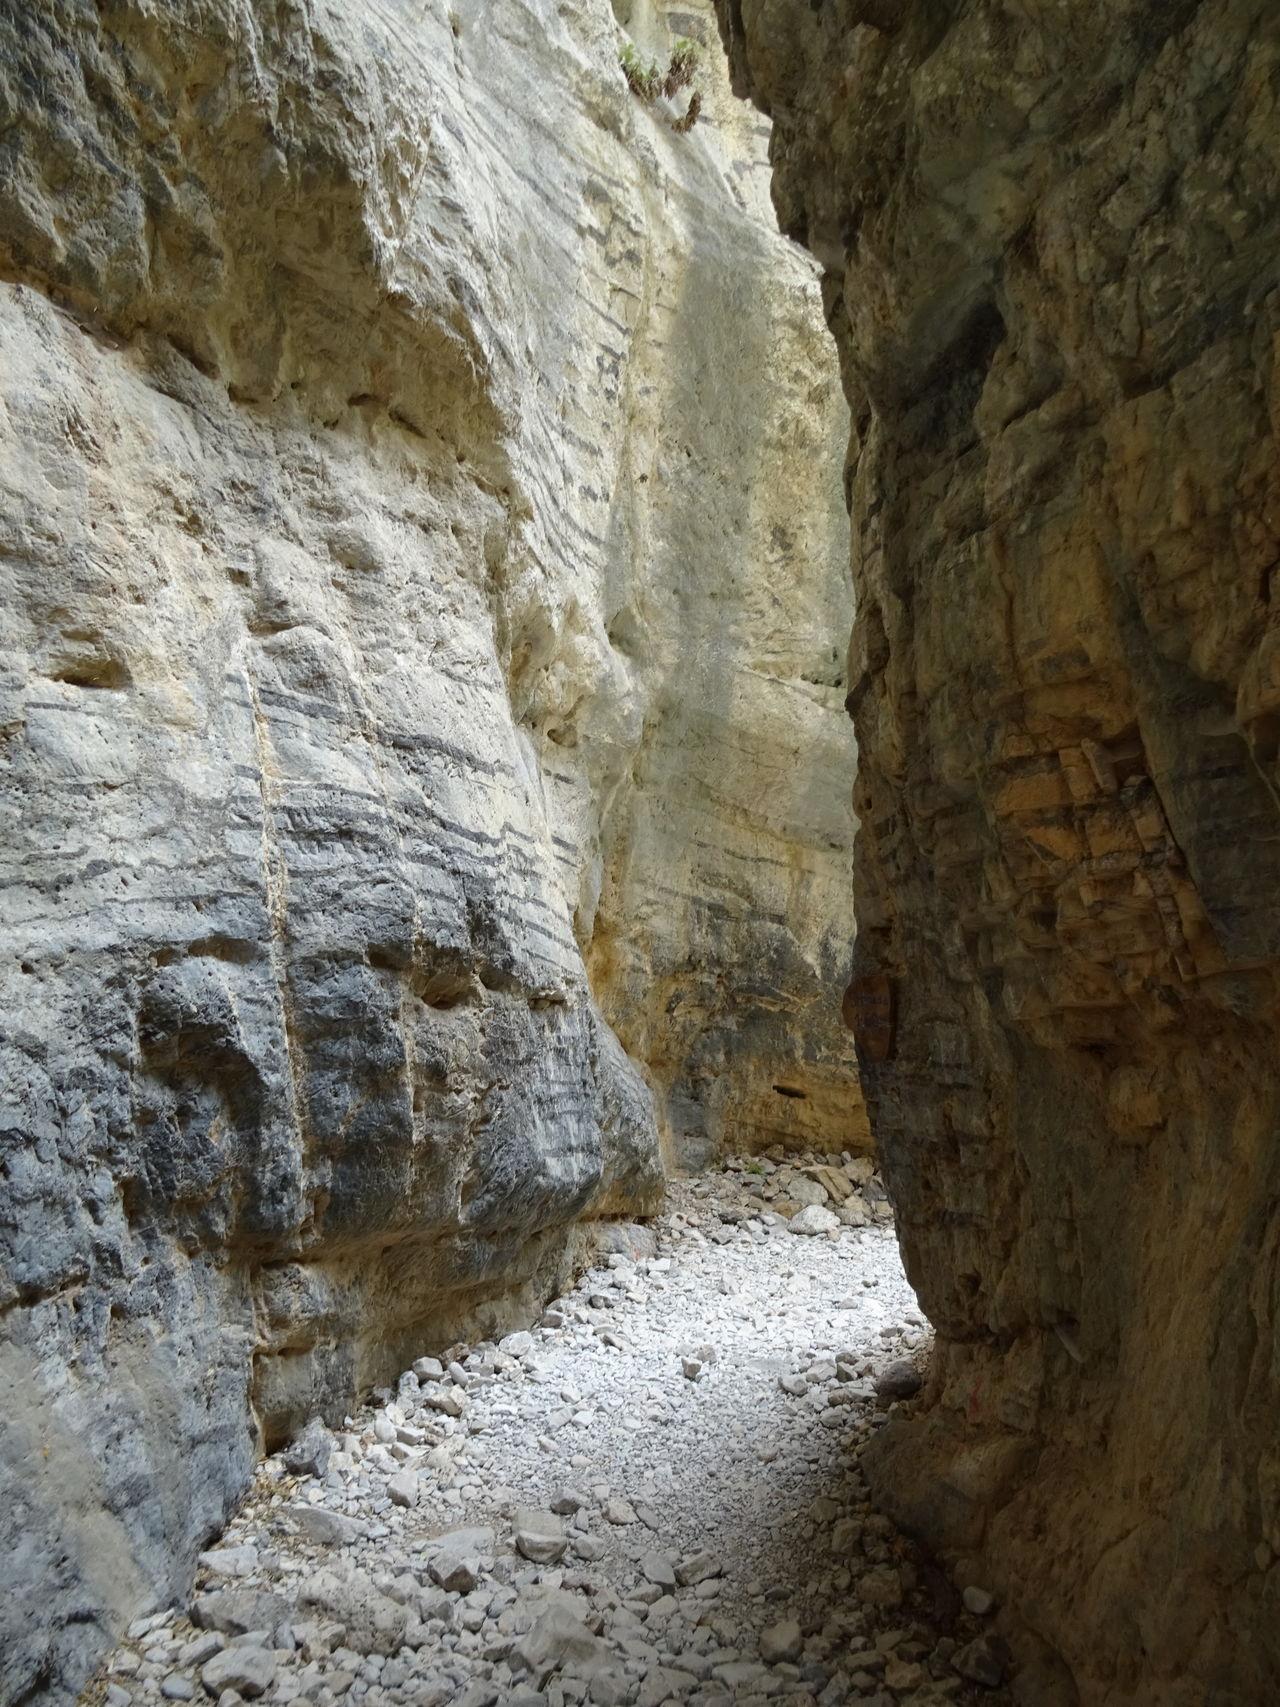 Chasm Crete Gap Greece Gulch Hiking Imbros June 2016 Kreta Landscape Nature Ravine Rock Rock - Object Rock Formation Travel